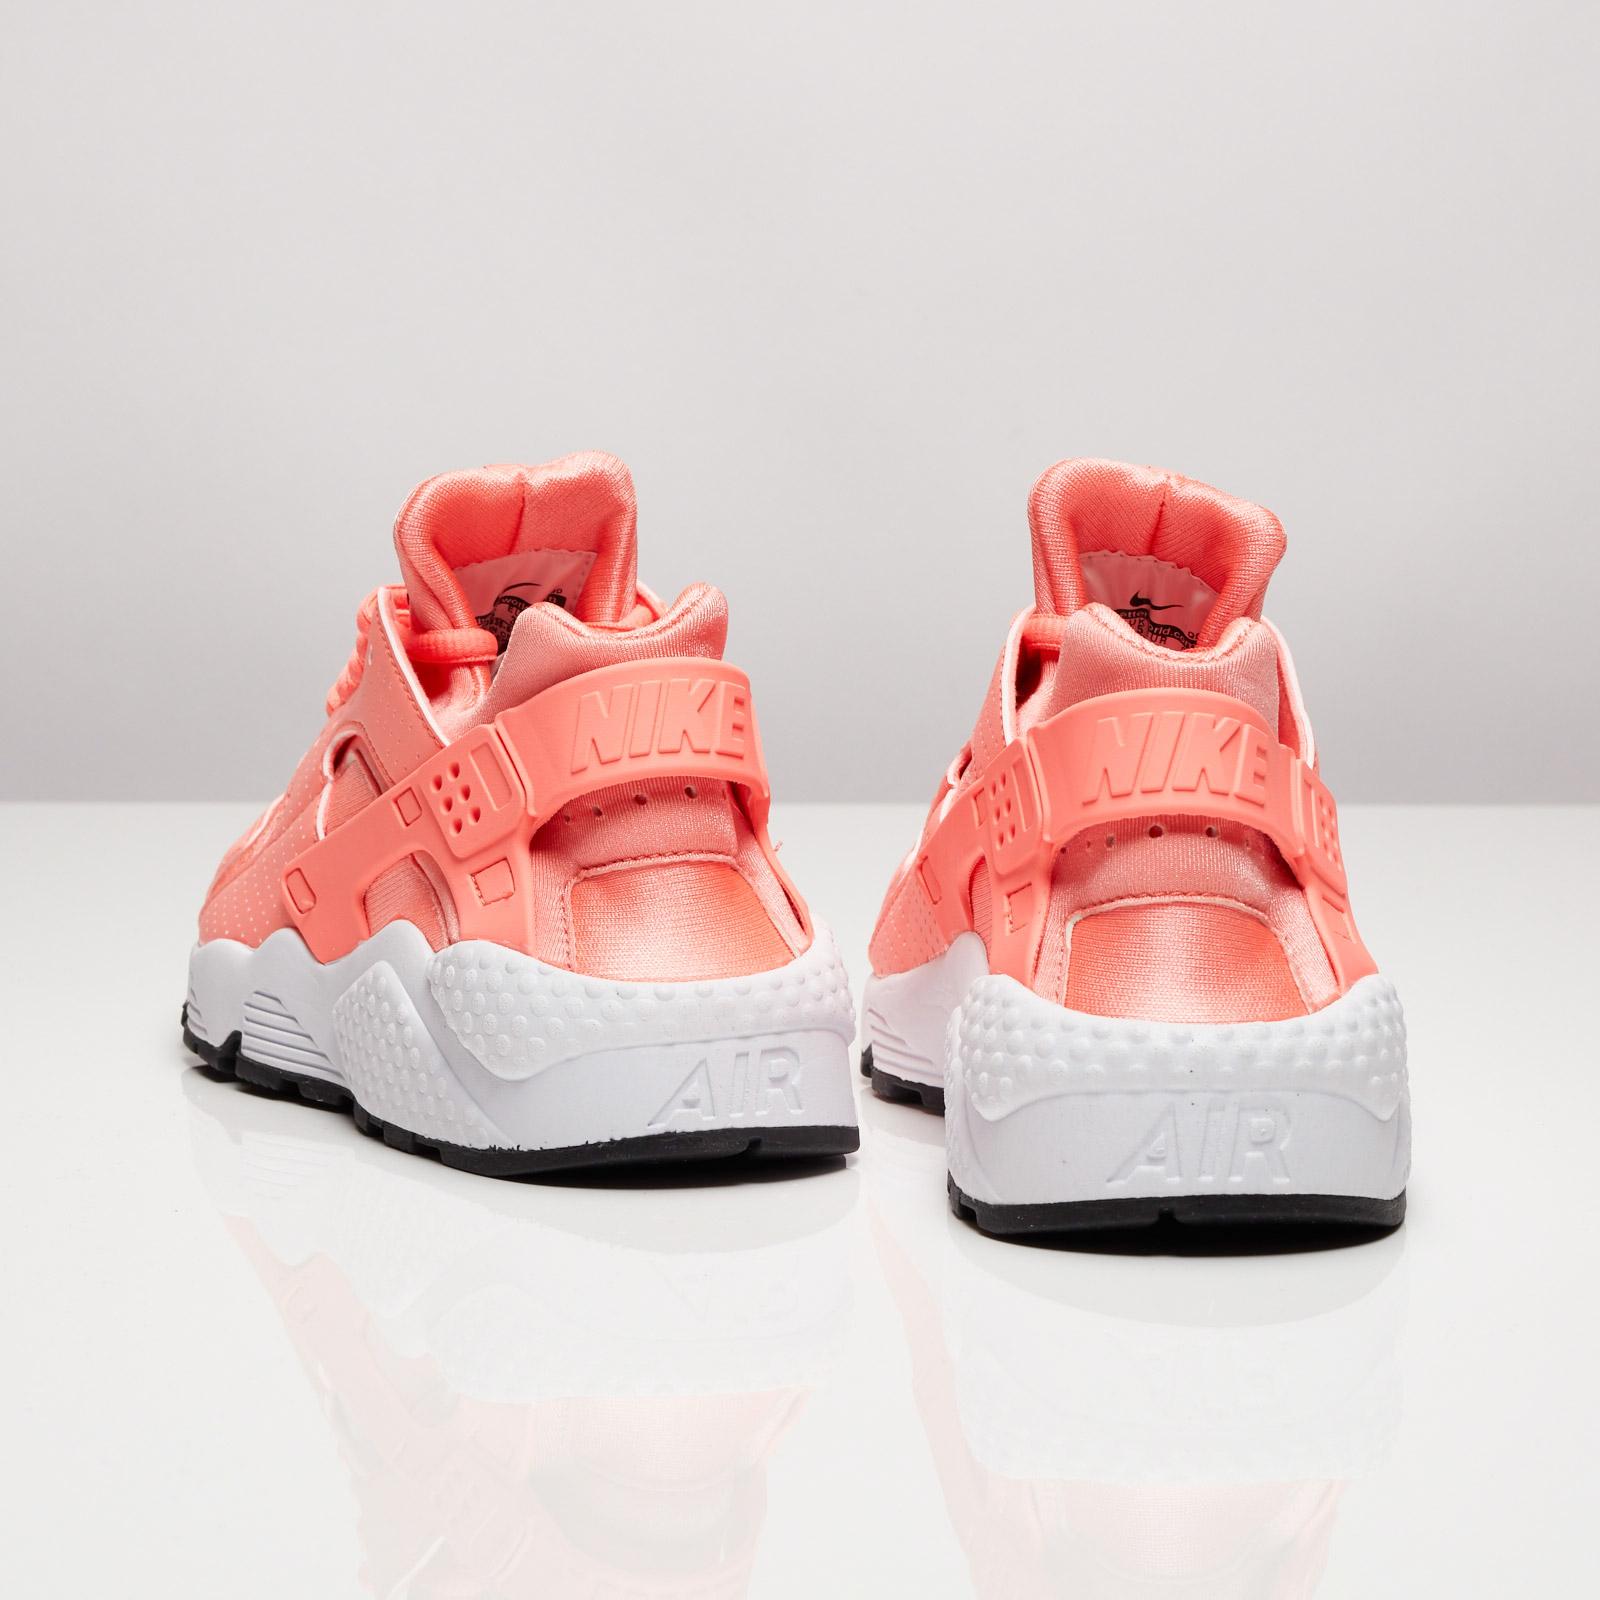 check out 18d5a 08038 Nike Wmns Air Huarache Run - 634835-603 - Sneakersnstuff   sneakers    streetwear online since 1999